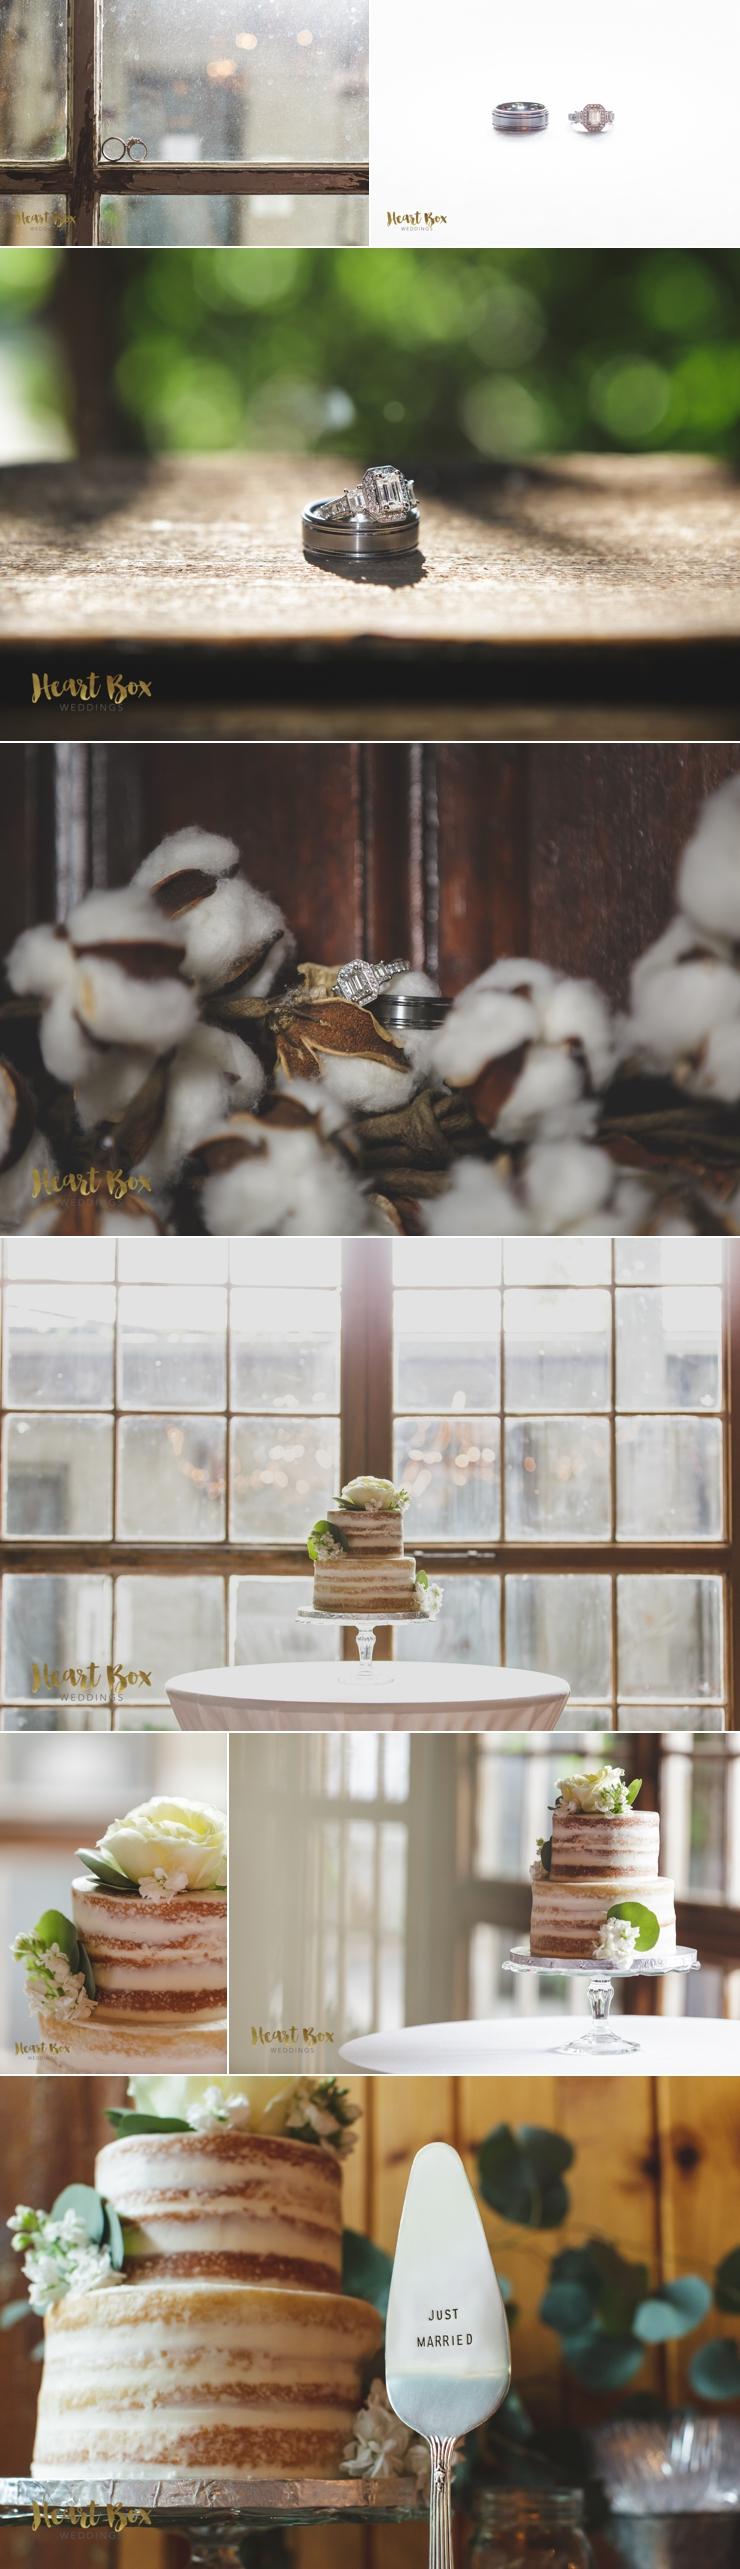 Popplewell Wedding Blog Collages 10.jpg